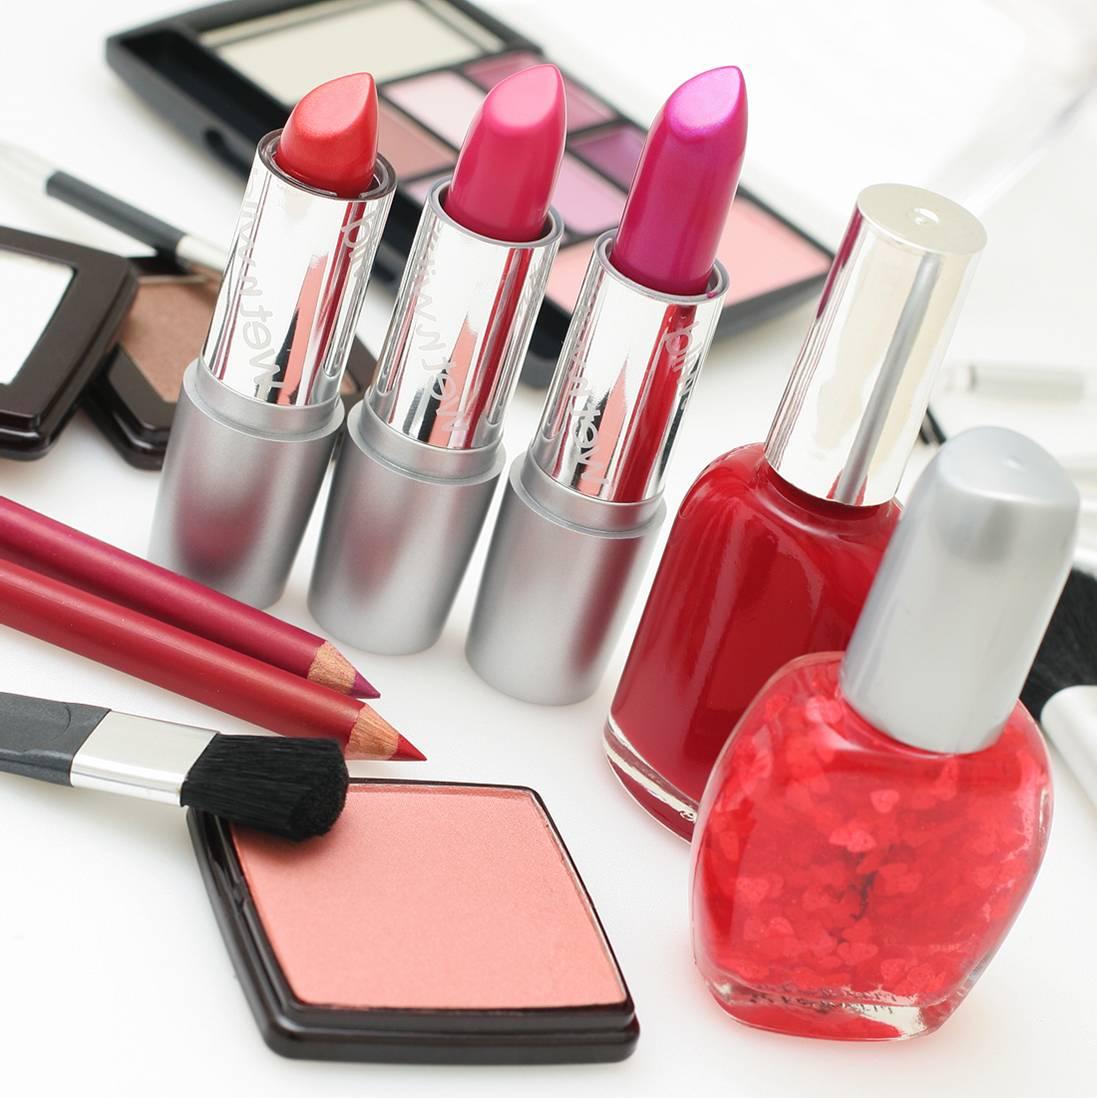 Kollektion Lady In Red von Ingrid Cosmetics